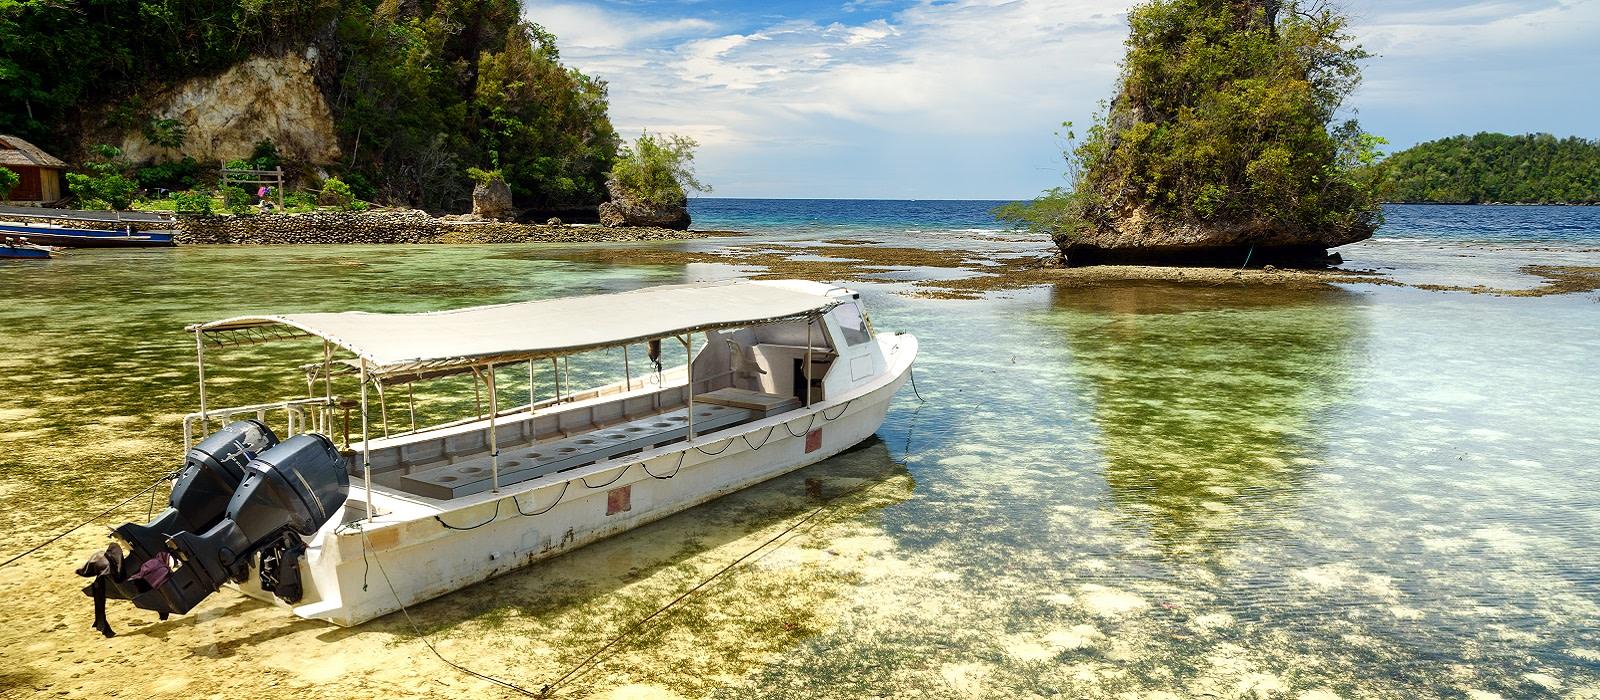 Reiseziel Sulawesi, Togian Islands Indonesien